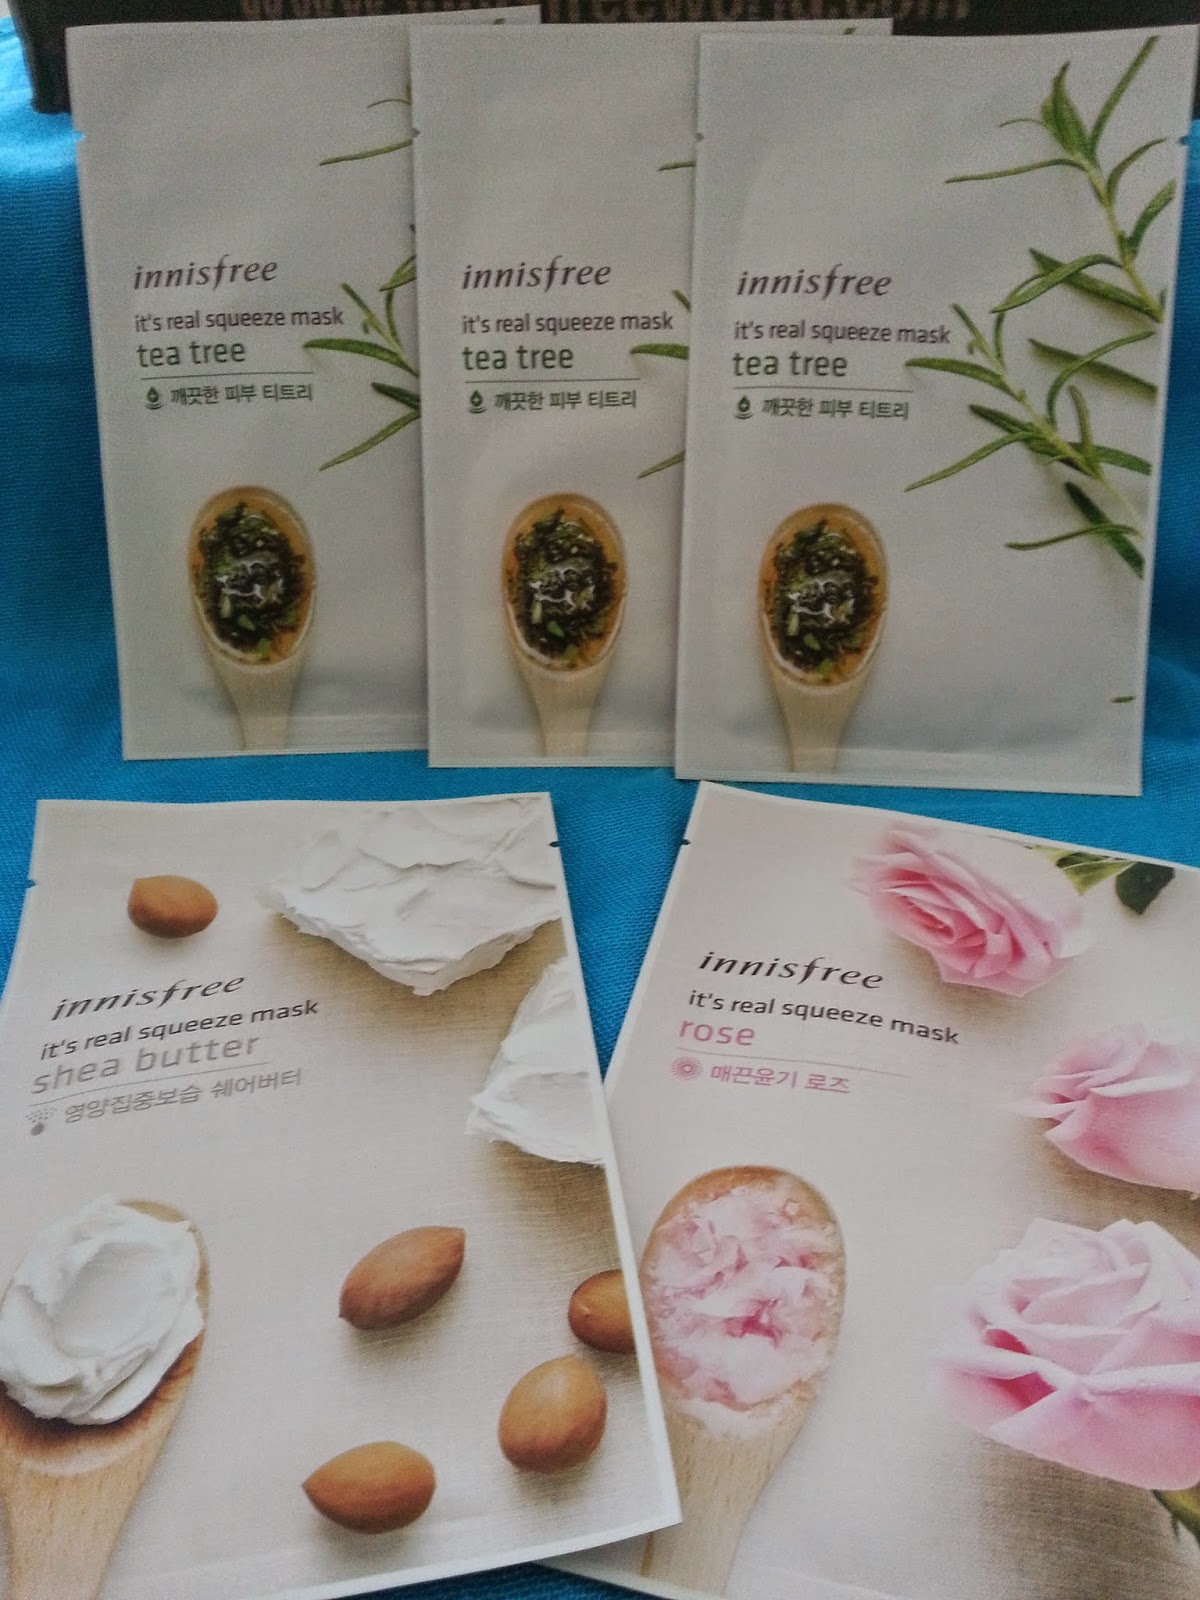 tea tree, shea butter, rose sheet masks